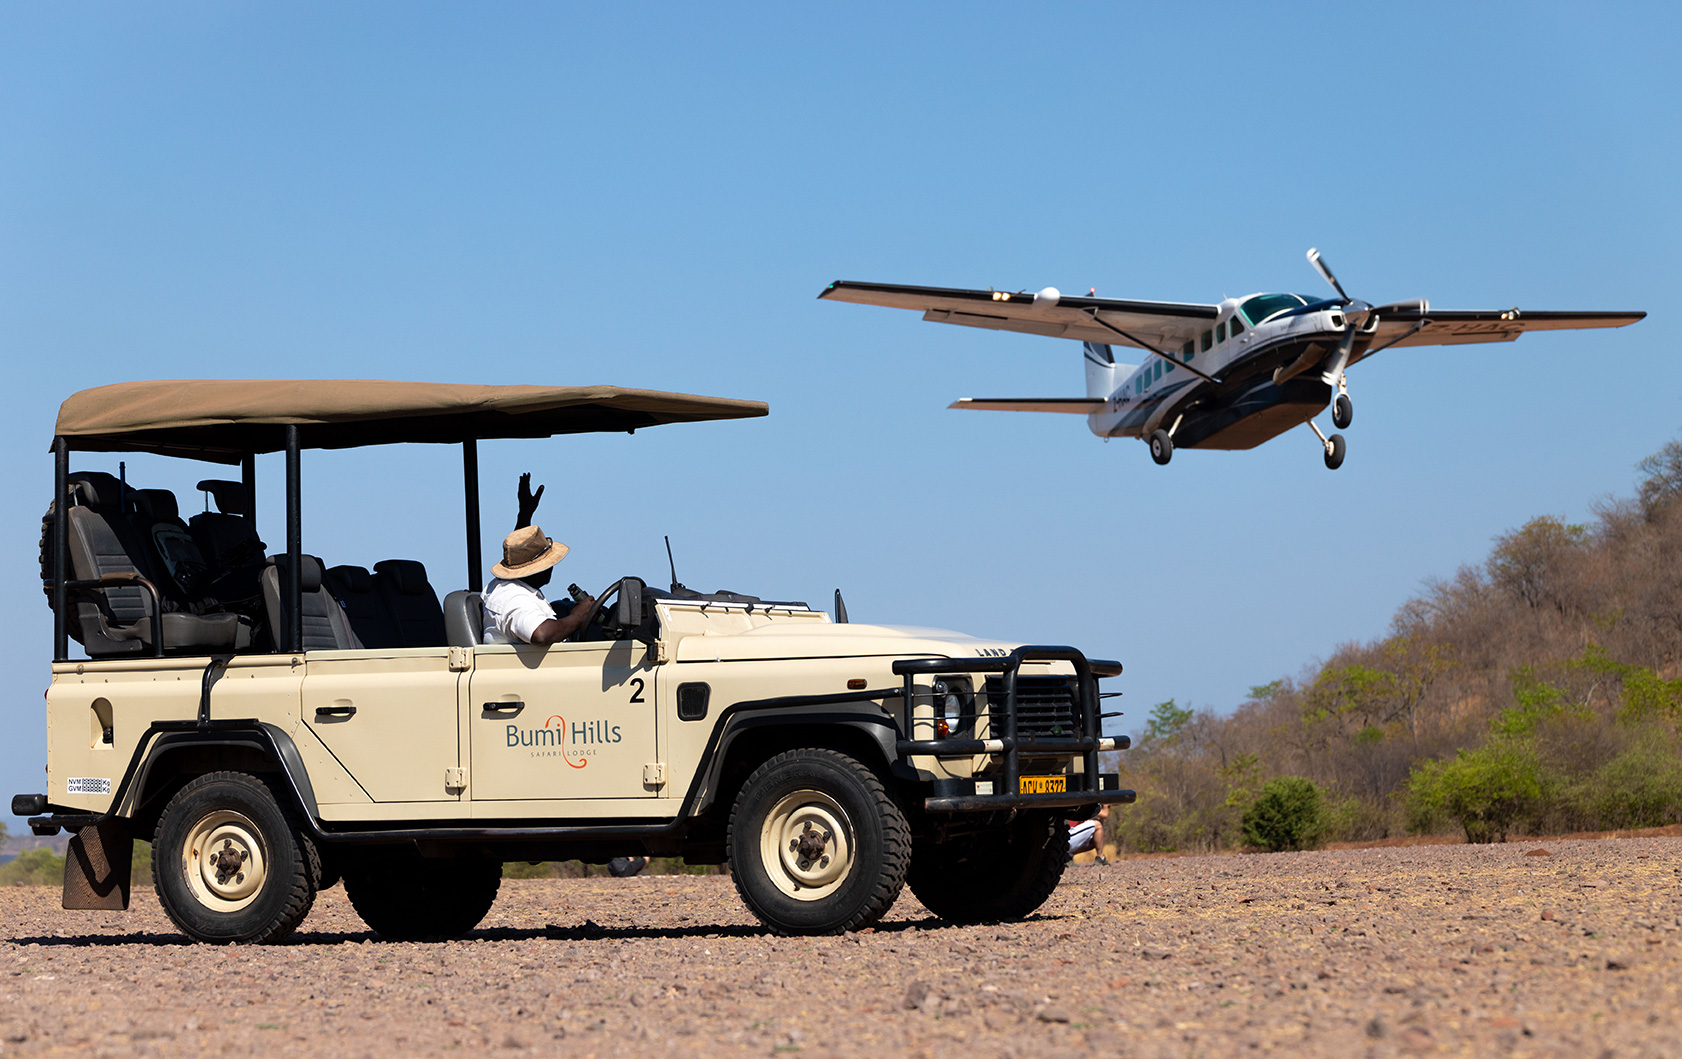 bumi-hills-safari-logistics-caravan-flight-plan-african-bush-camps